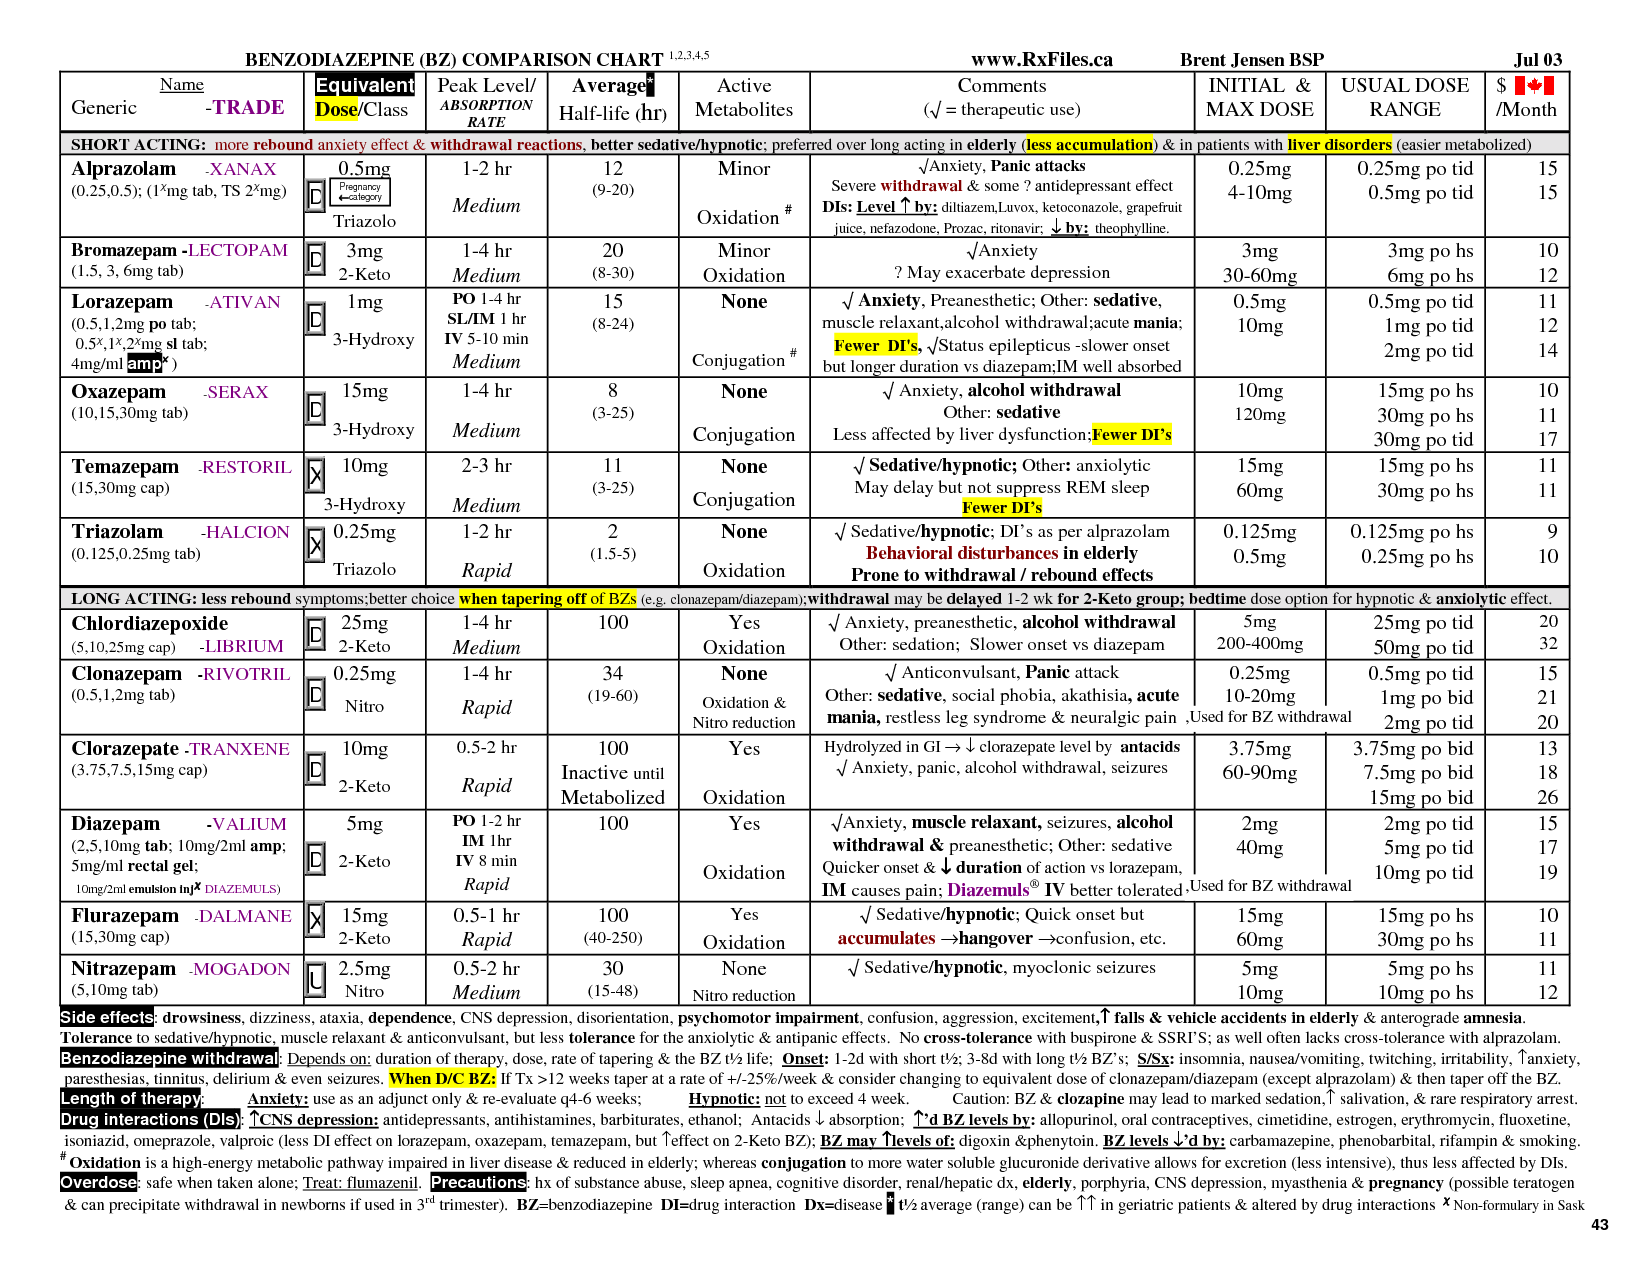 Benzodiazepine Equivalency Chart